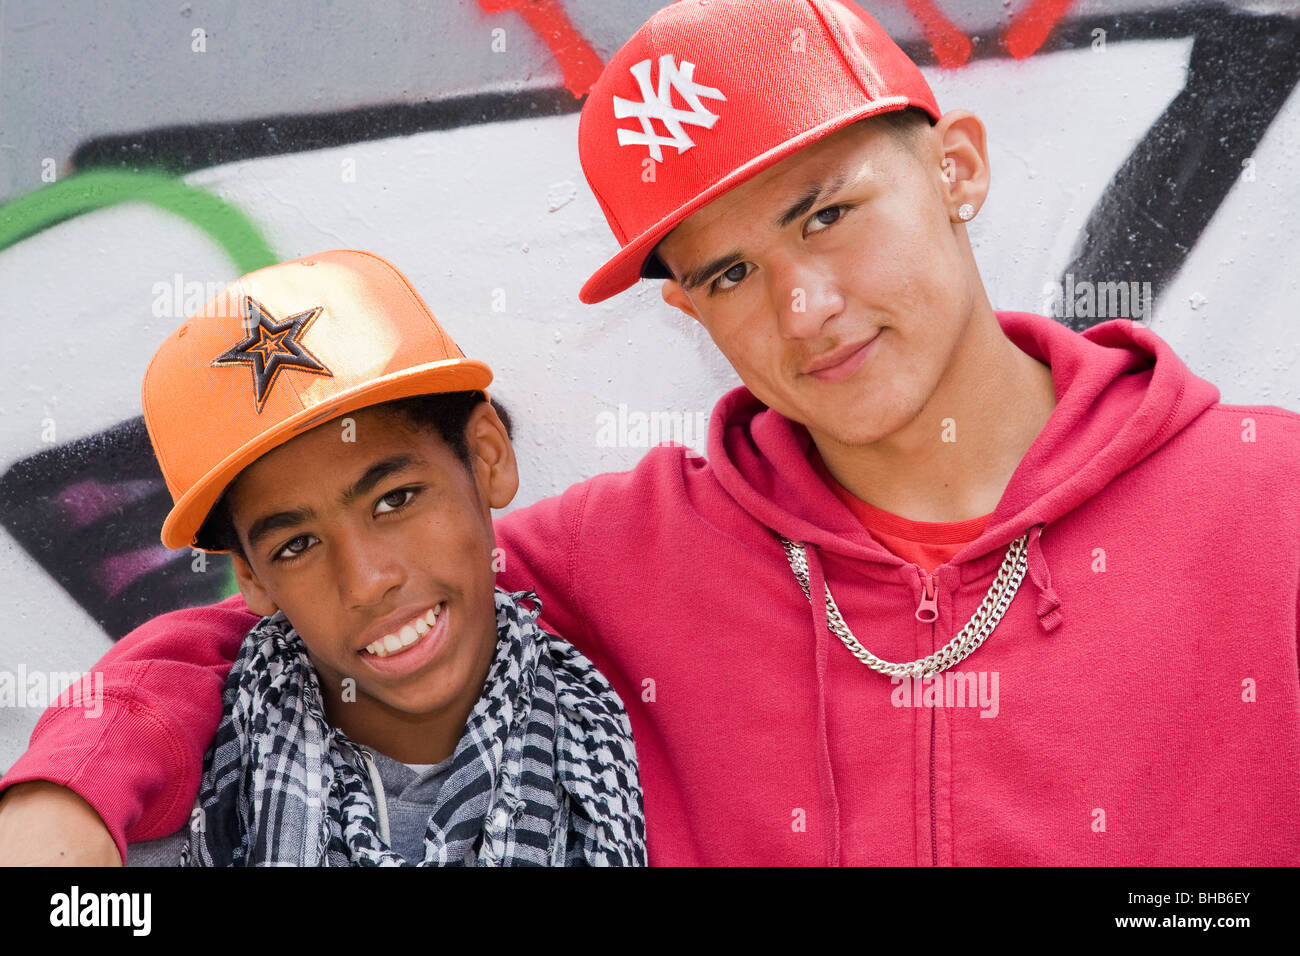 Hispanic and Black Teenagers smiling - Stock Image